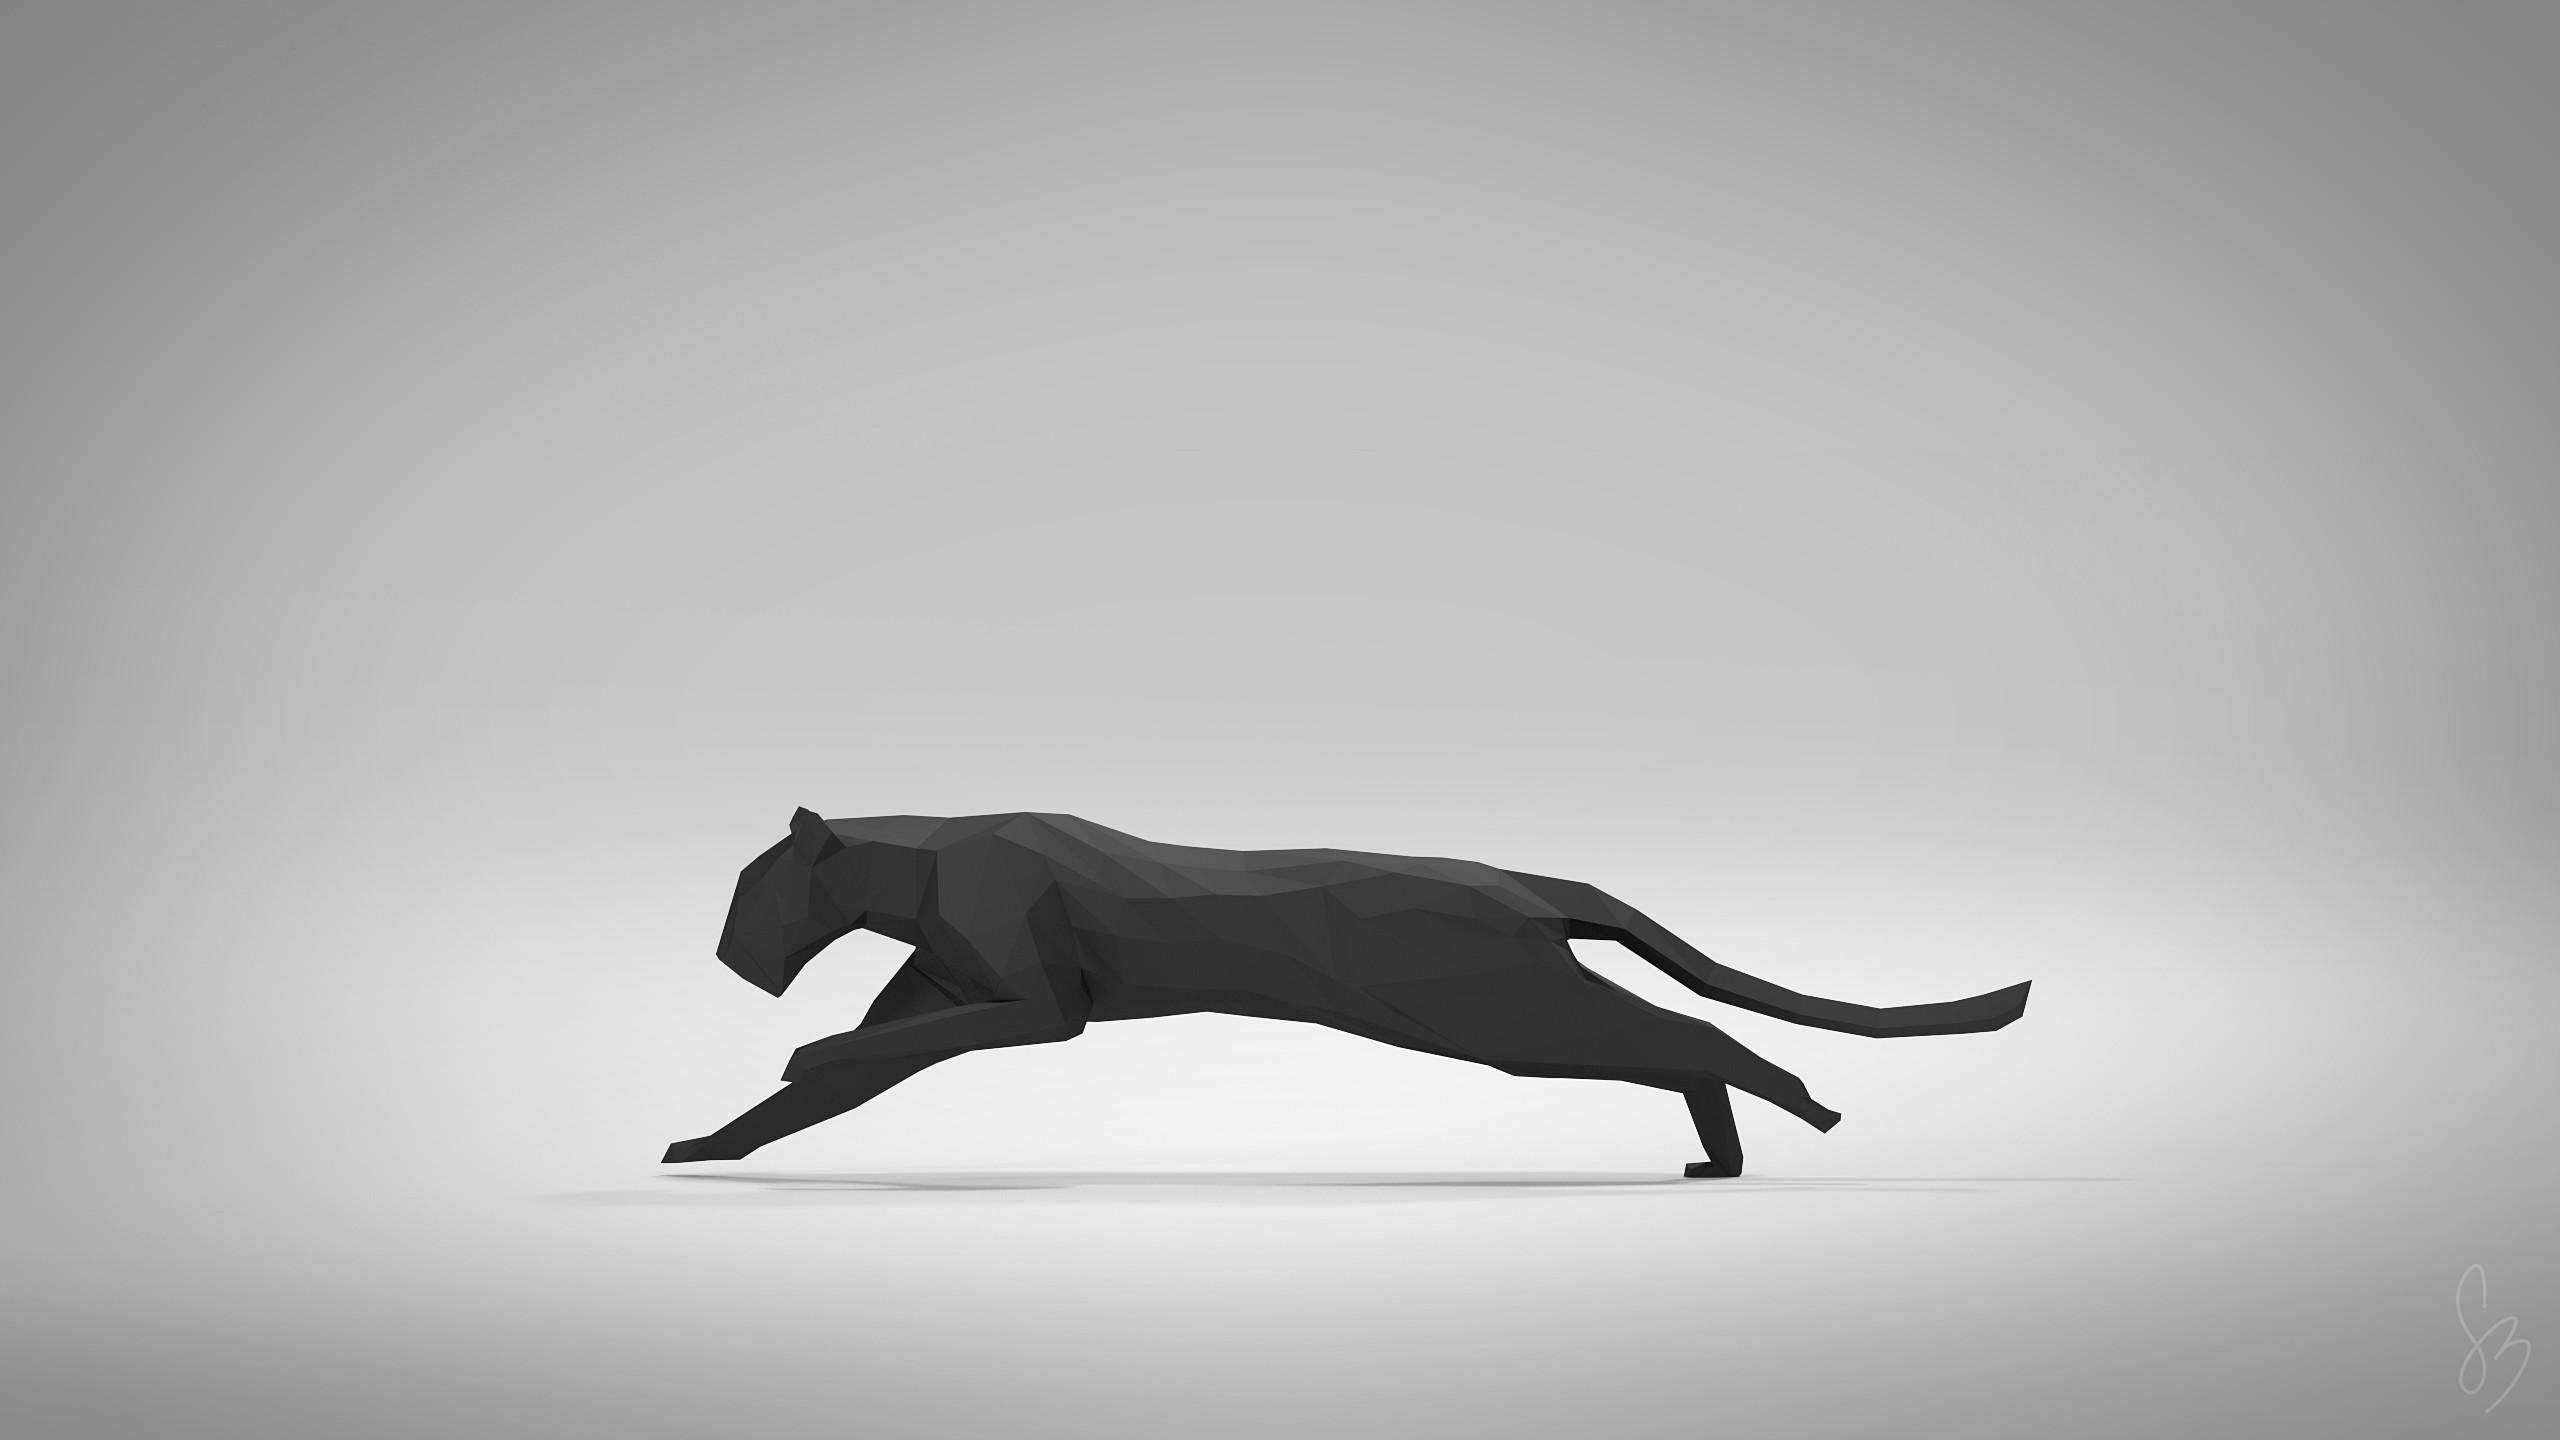 General animals digital art pumas minimalism simple background  running black vector artwork low poly gray